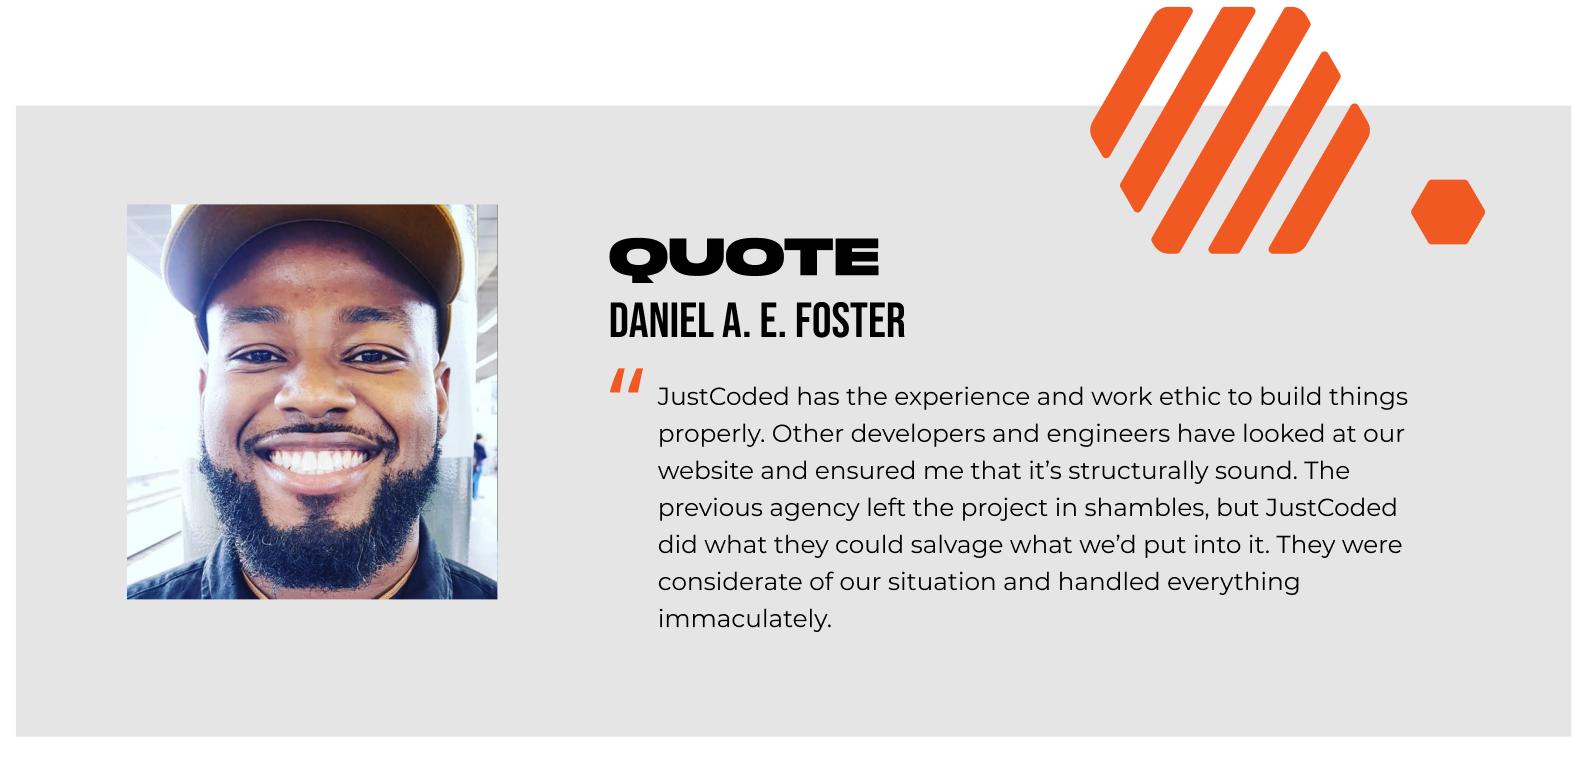 Daniel Foster's feedback